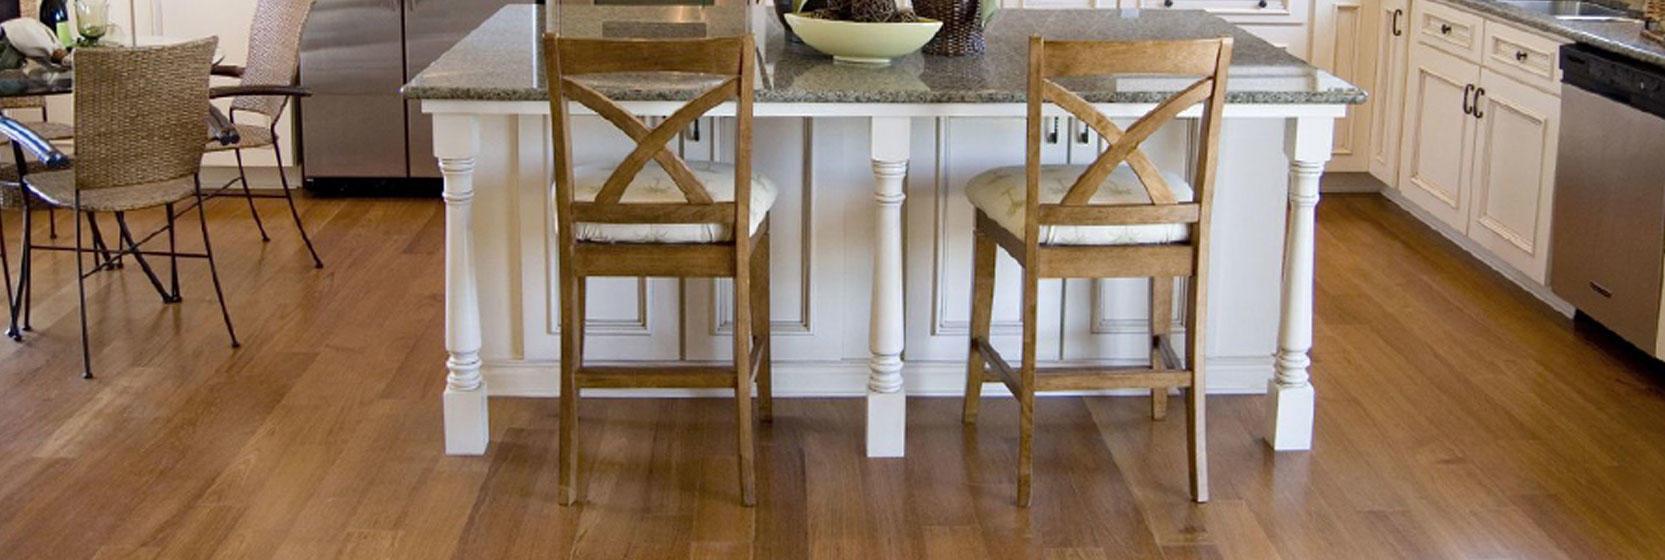 Molyneaux Tile, Carpet & Wood image 0